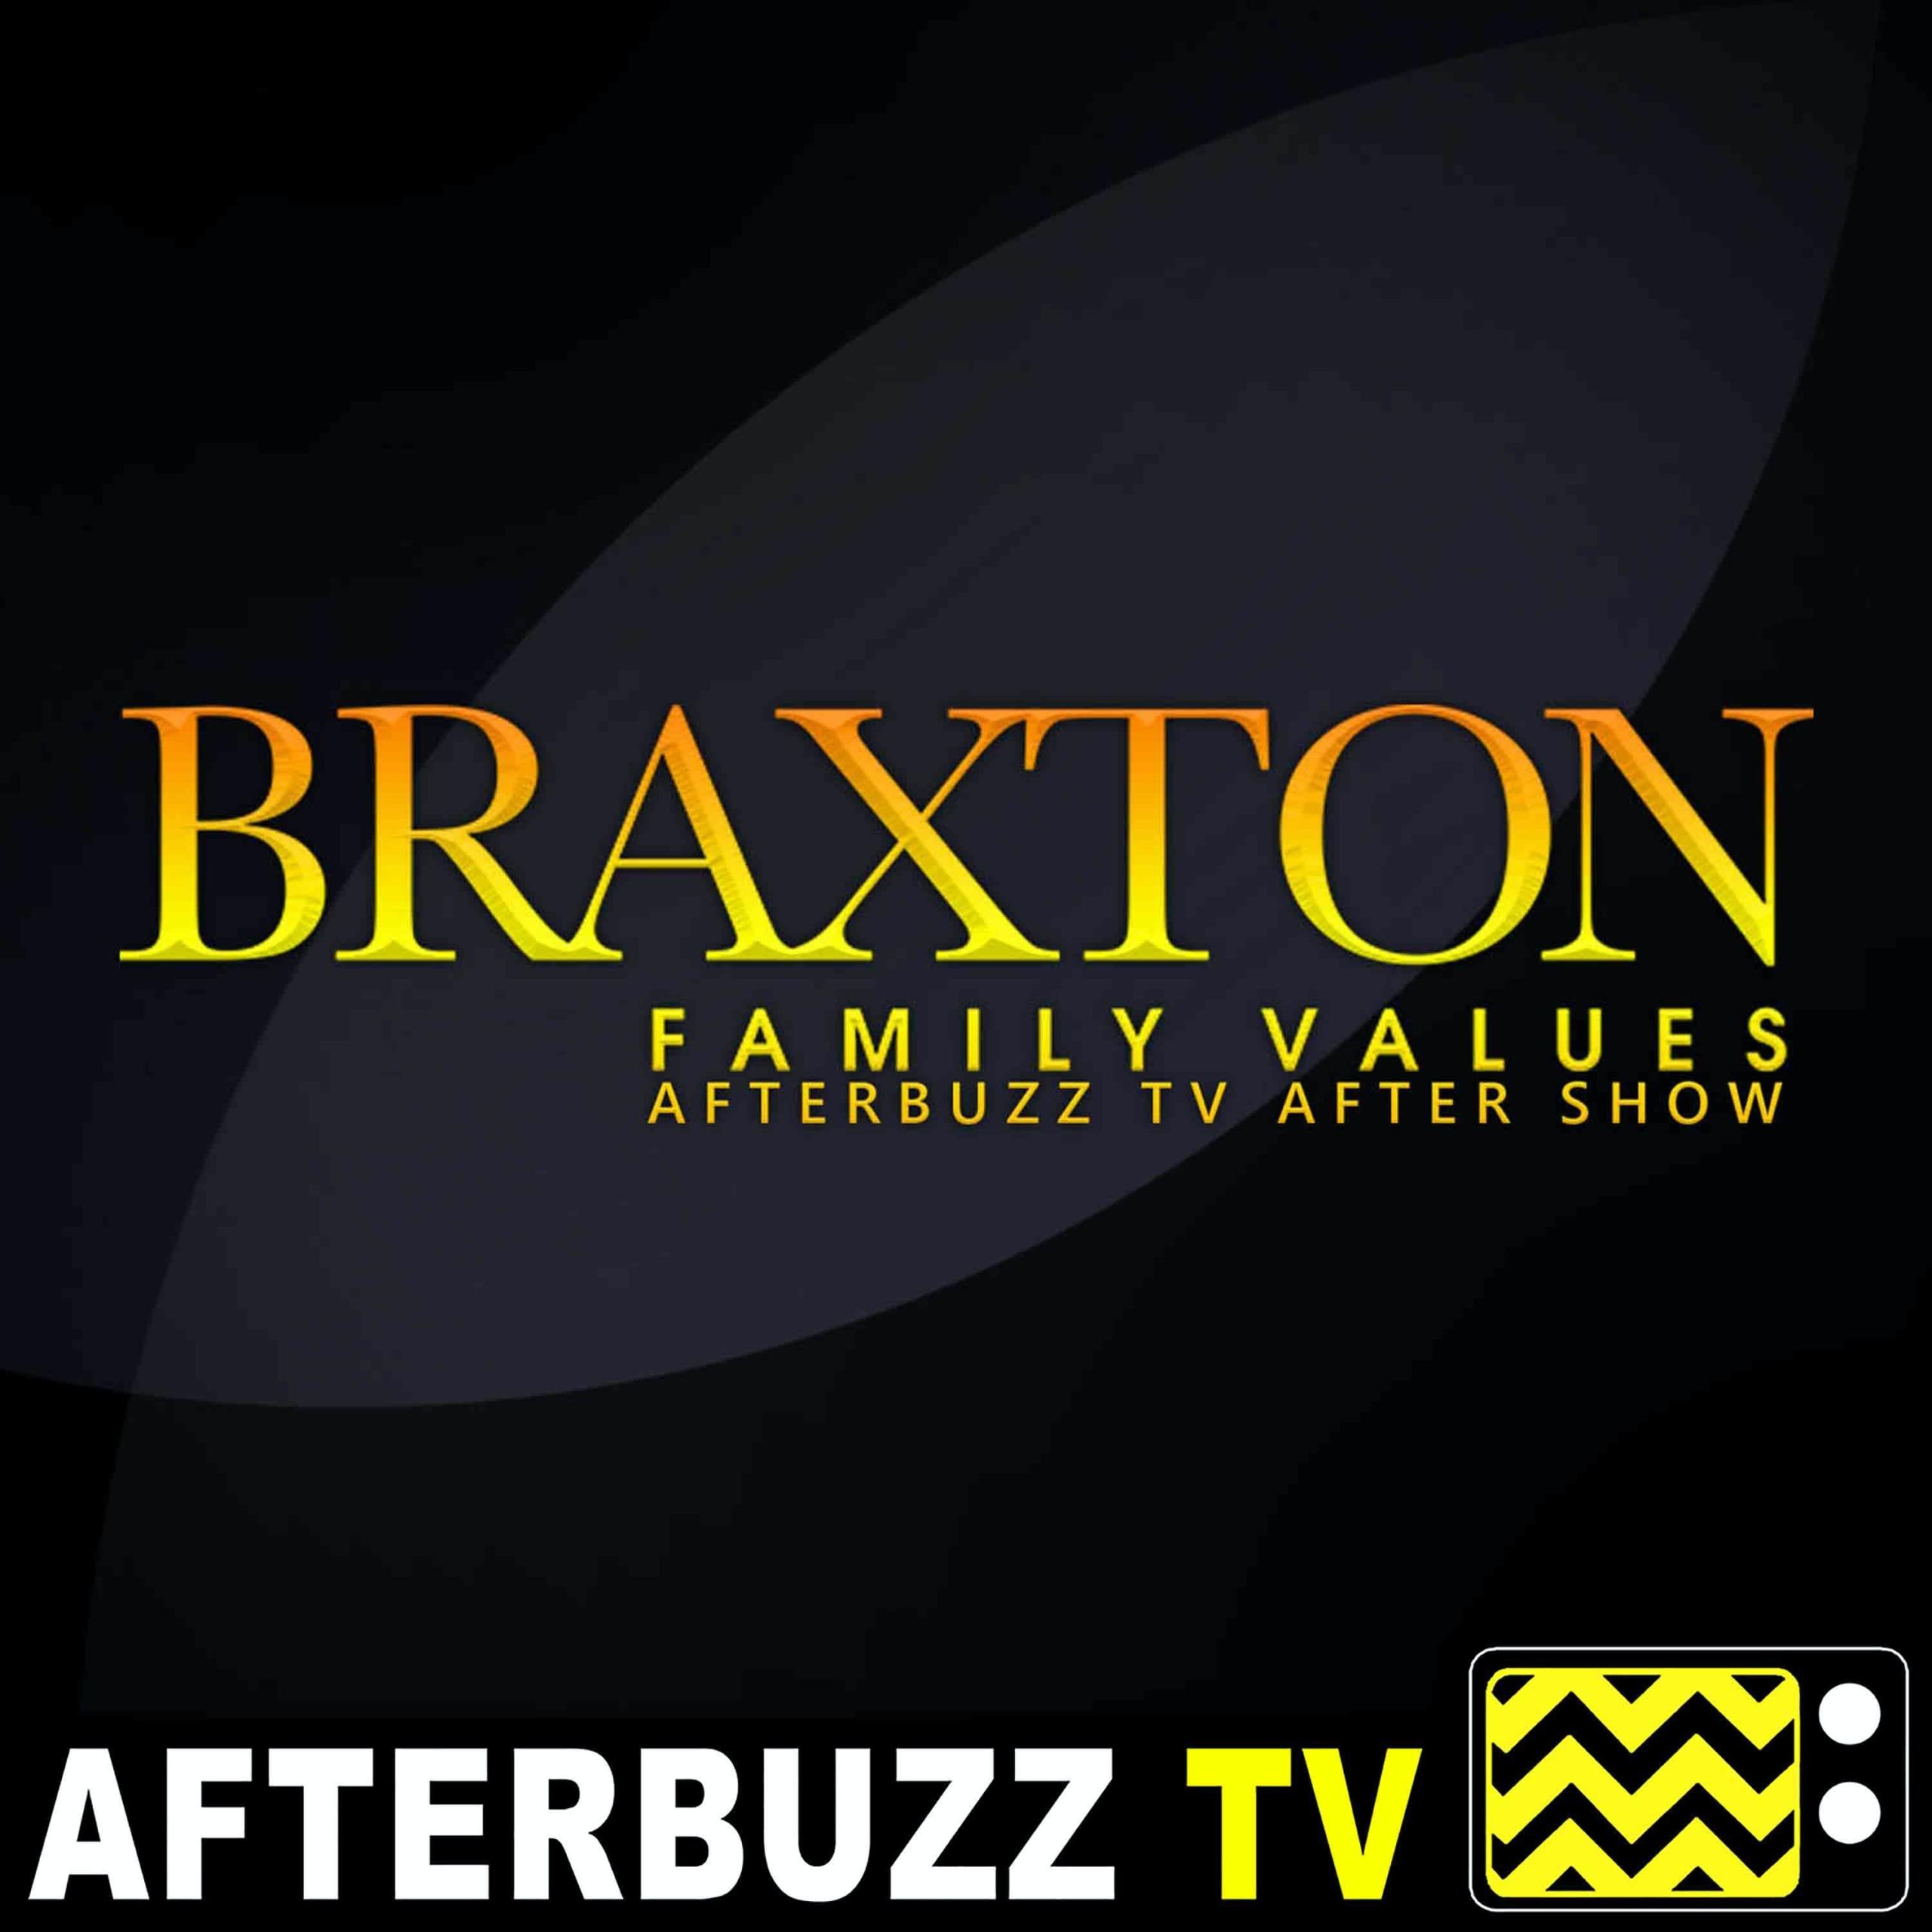 """Engaged & Enraged"" Season 6 Episode 26 'Braxton Family Values' Review"